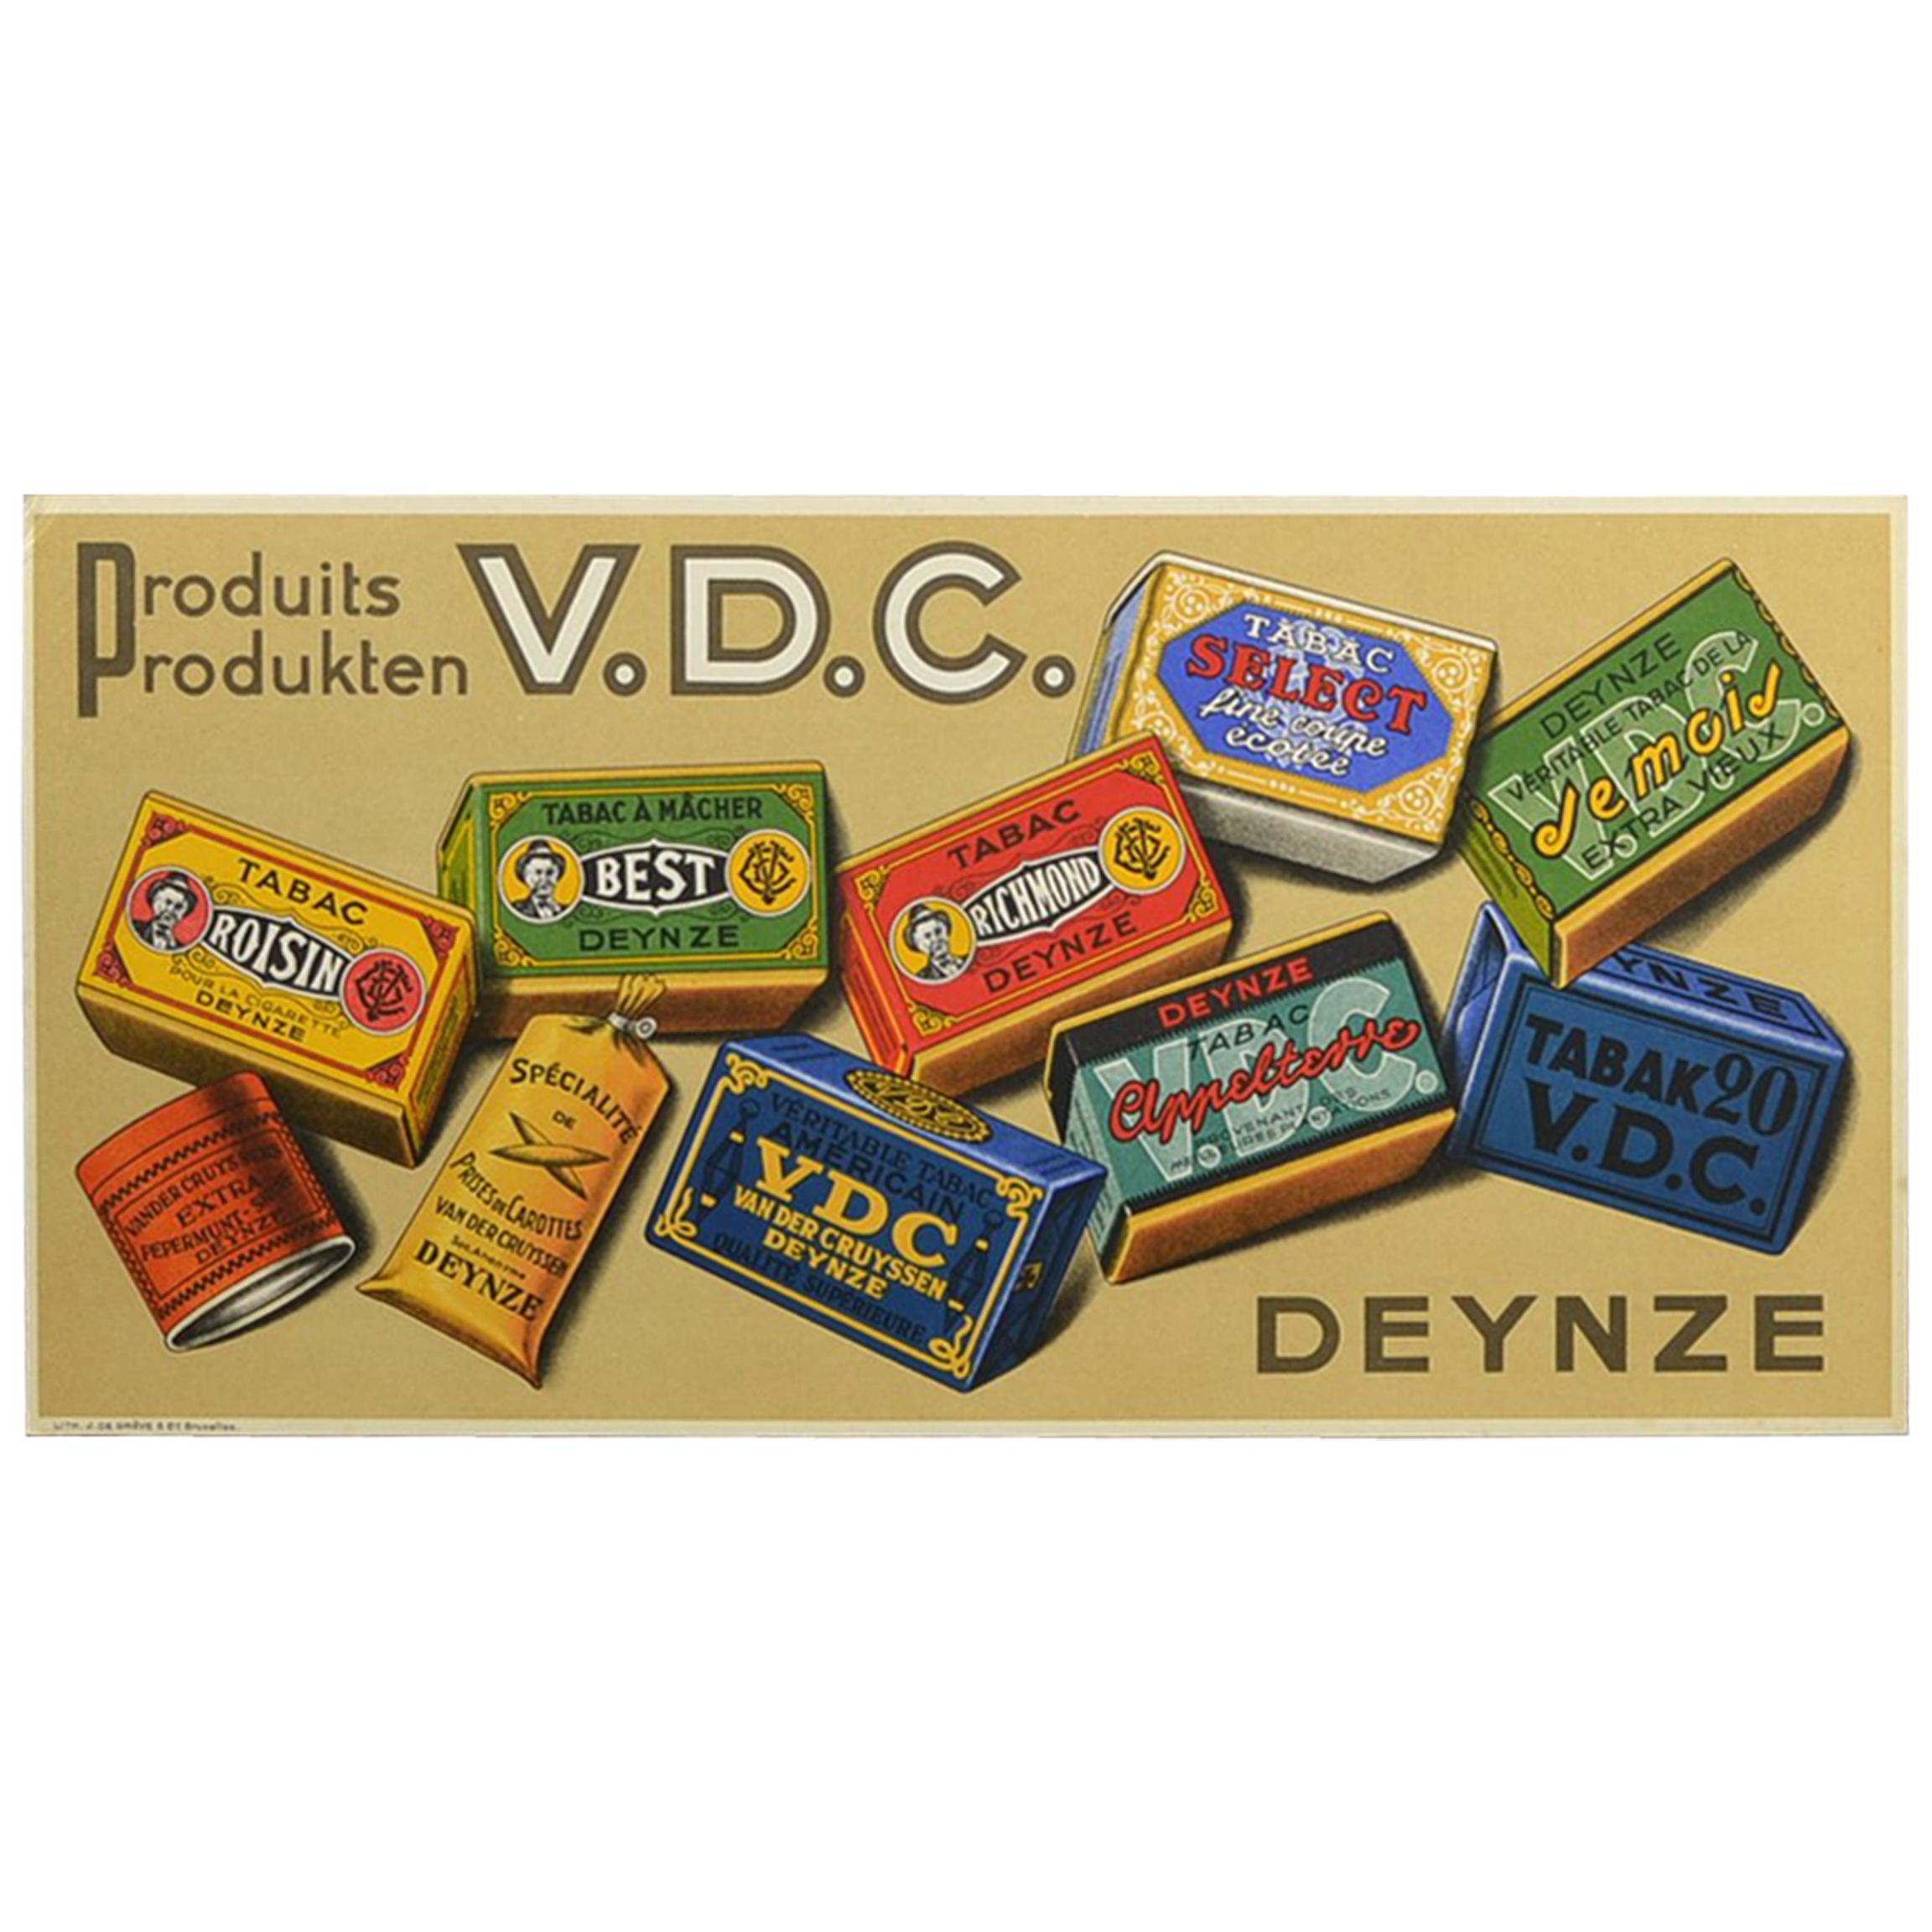 Vintage Tobacco Advertising Sign, Belgium, 1950s